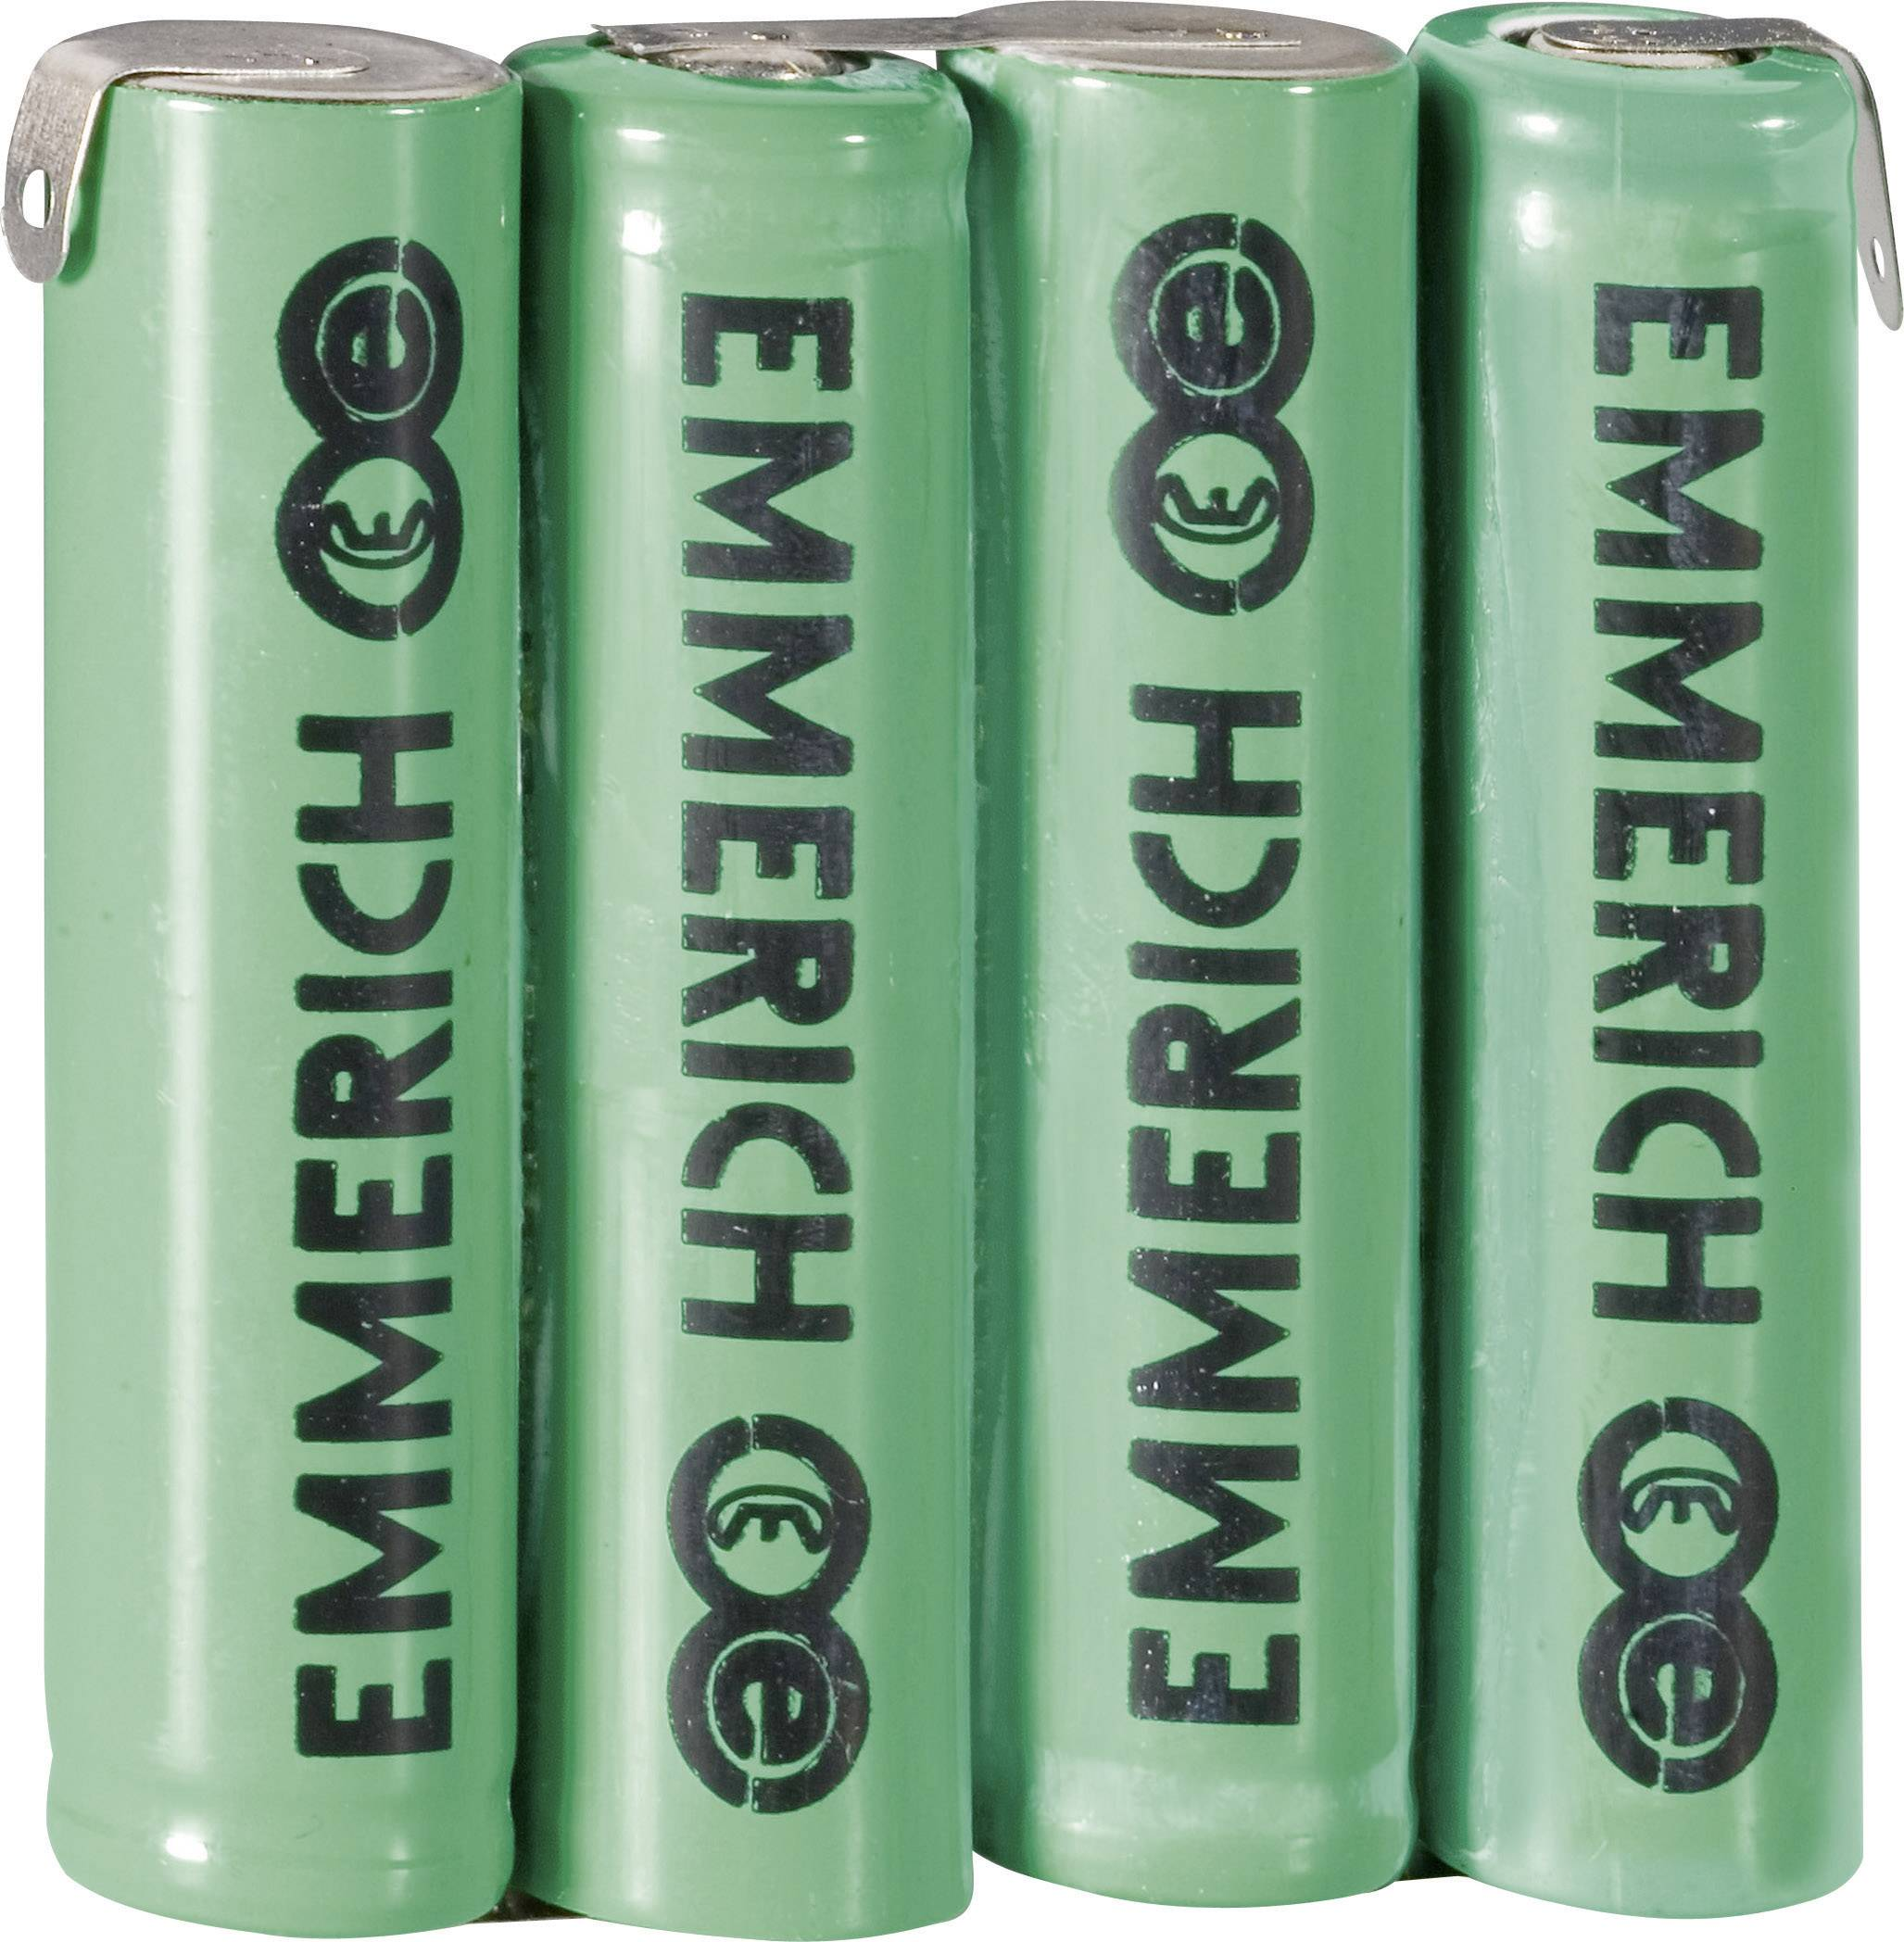 Emmerich NiMH akumulátorové zostavy Micro (AAA) 800 mAh 4,8V, FT-1Z